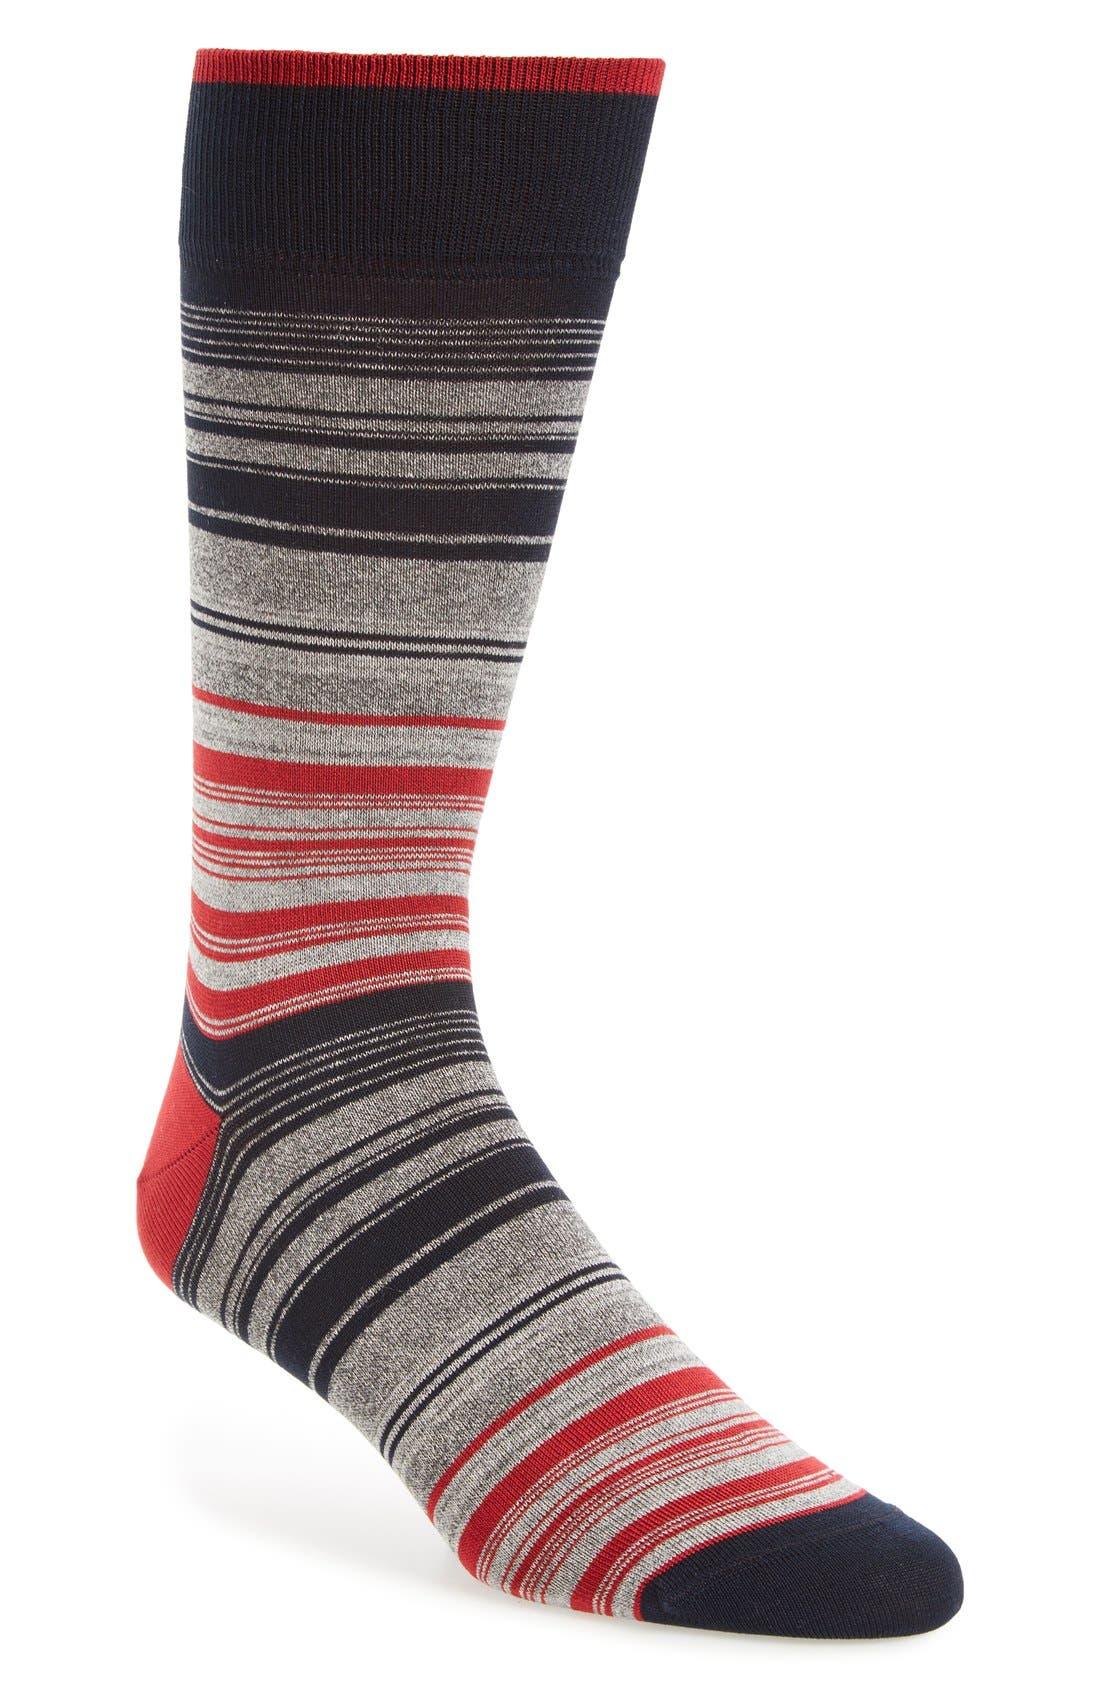 Mercerized Cotton Blend Socks,                             Main thumbnail 1, color,                             Ruby/ Grey